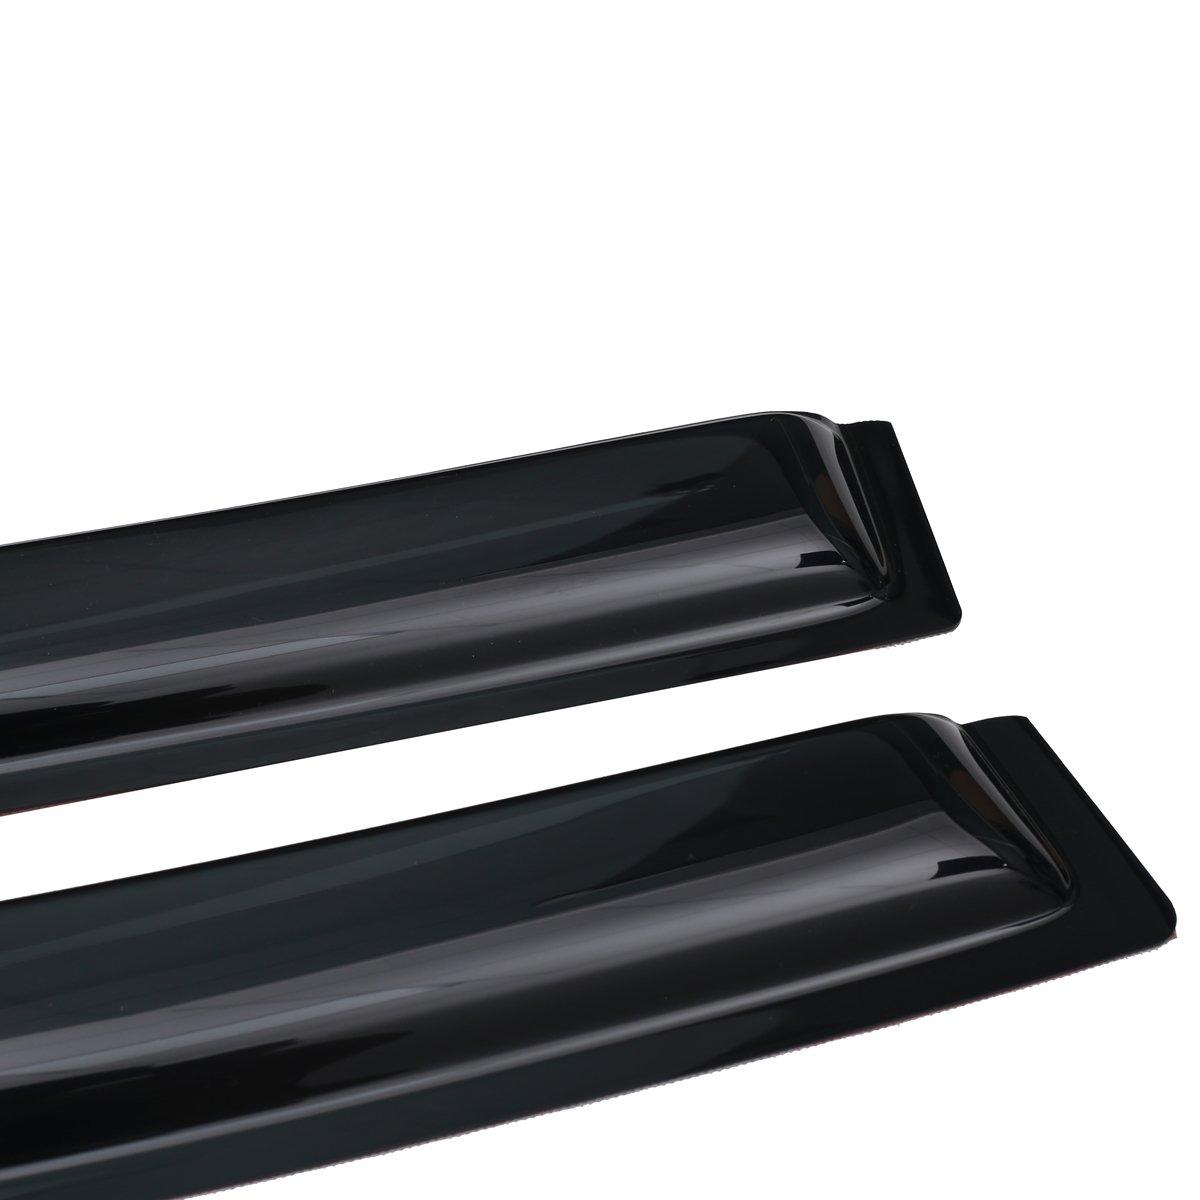 Lightornic Vent Visor WV94376 Side Window Deflector for 2015-2019 Subaru Outback 4Piece Set